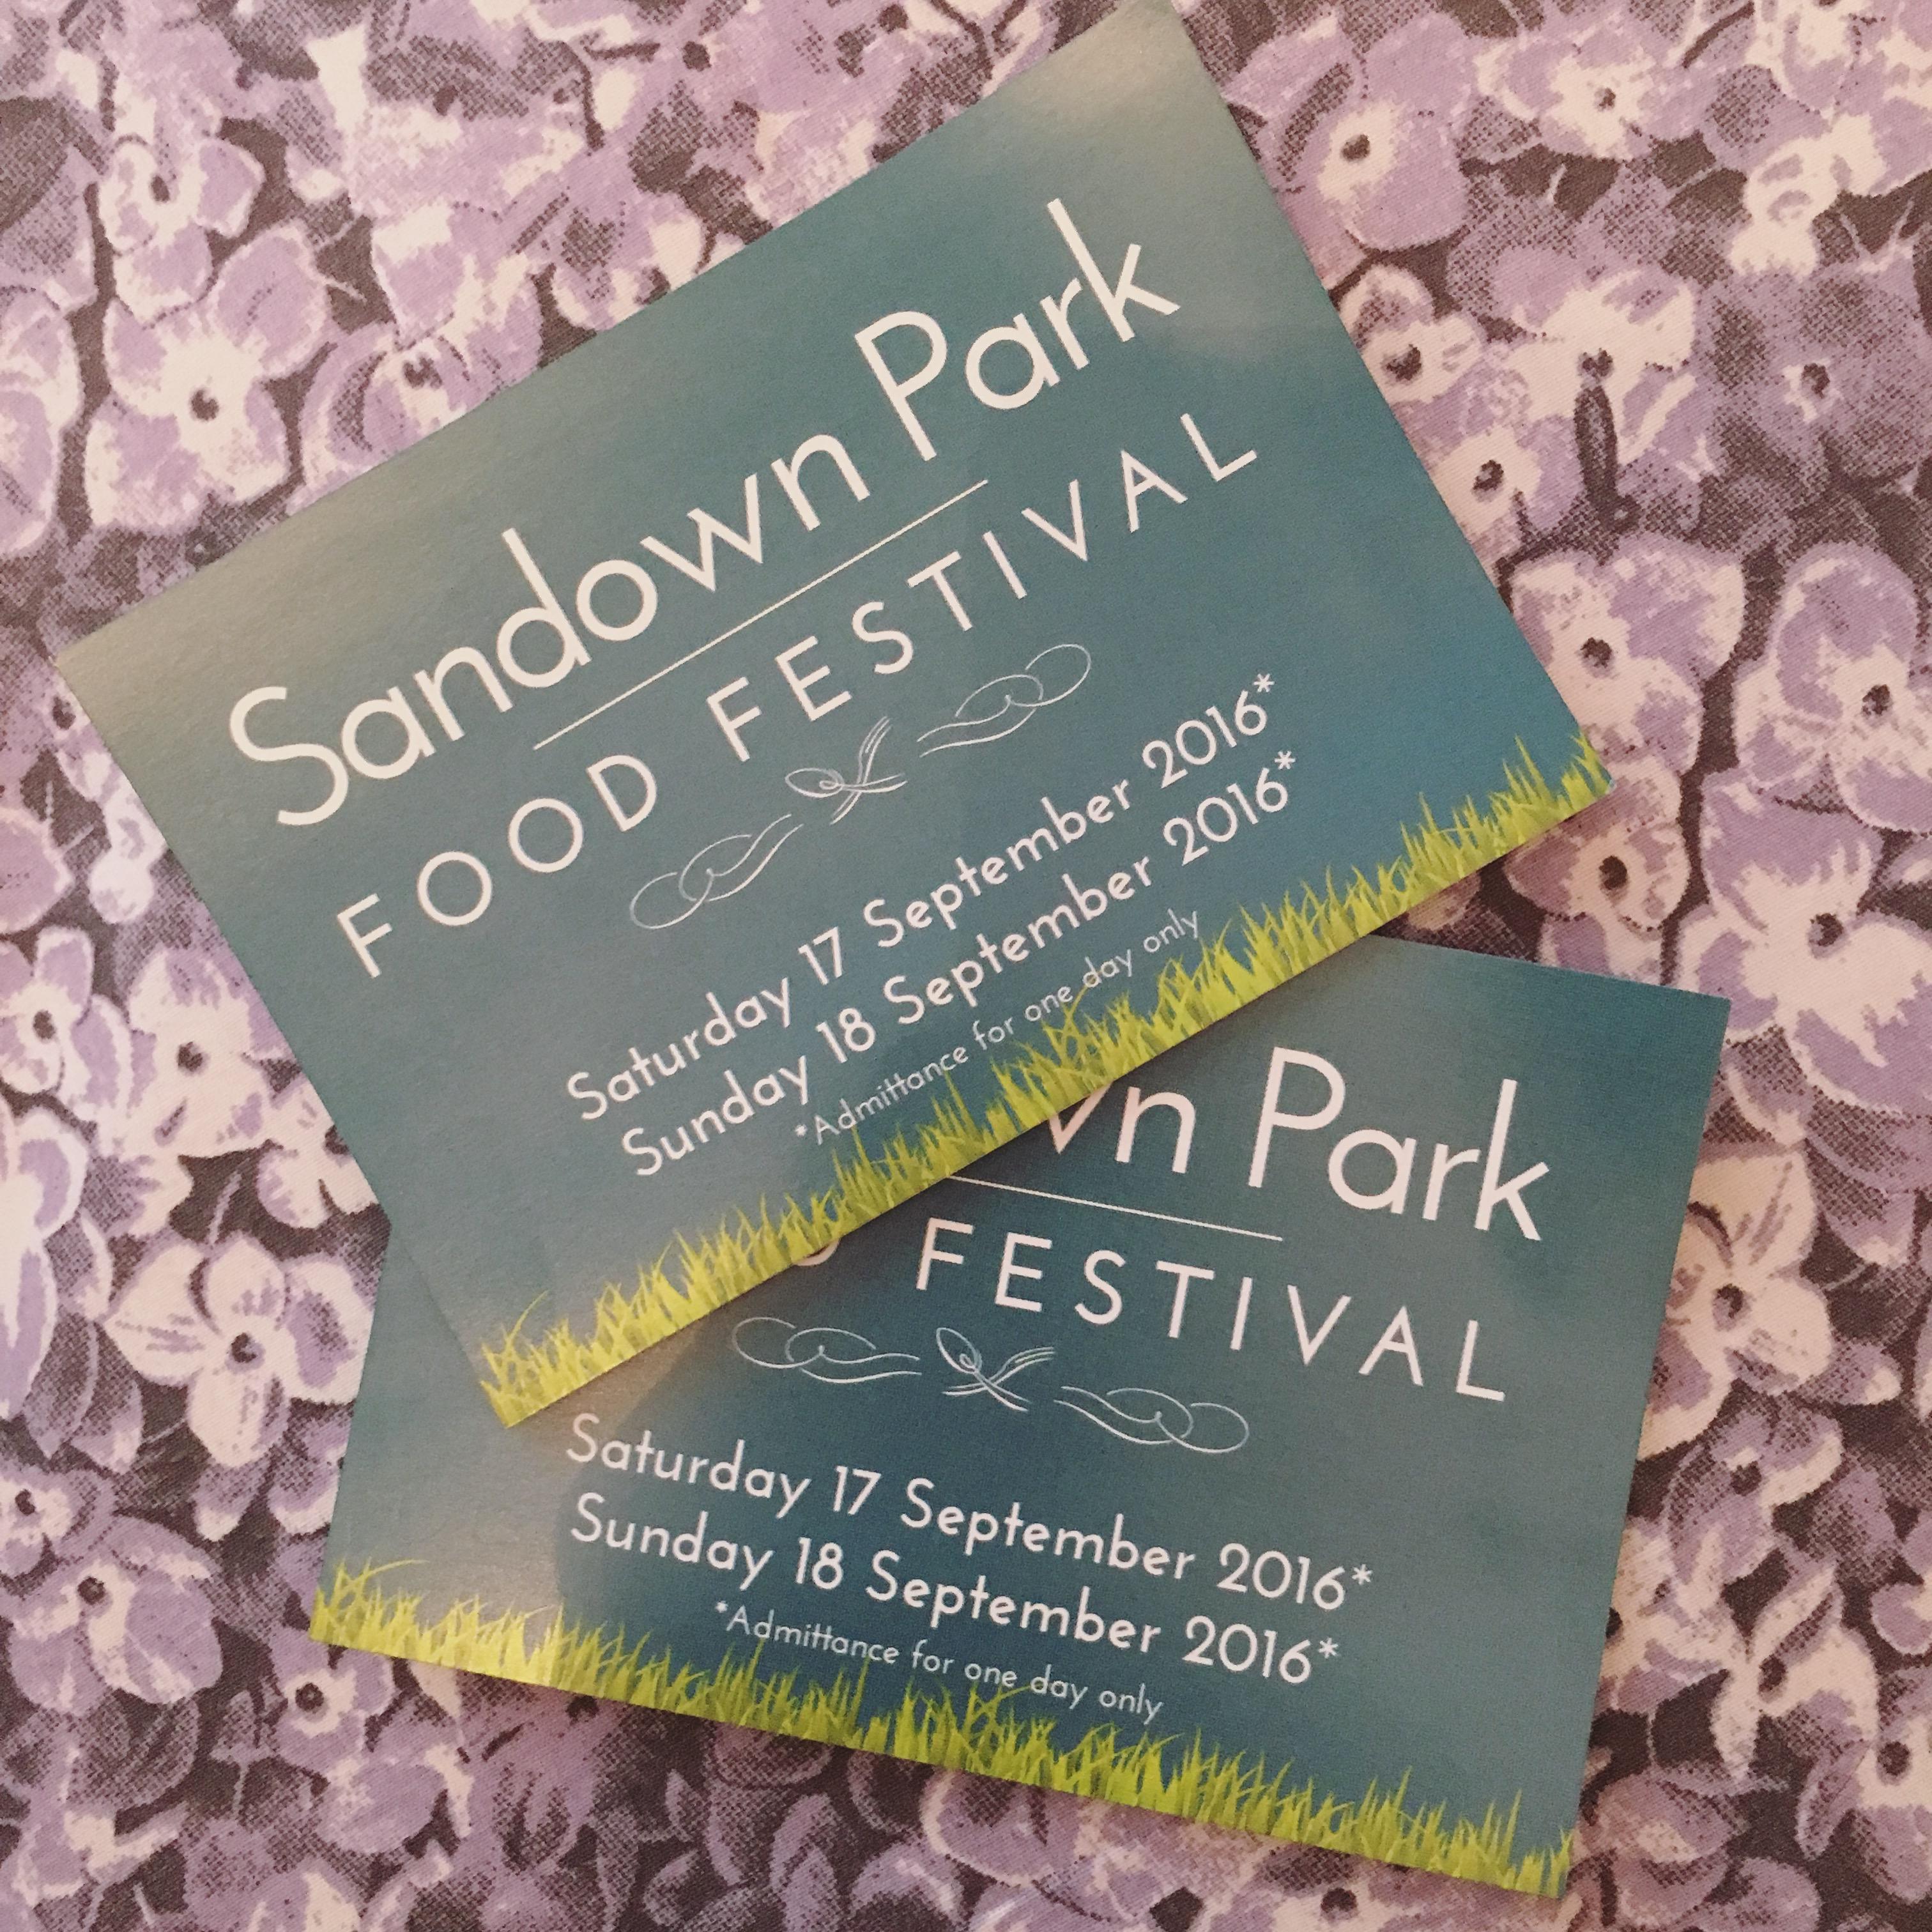 Sandown Park Food Festival